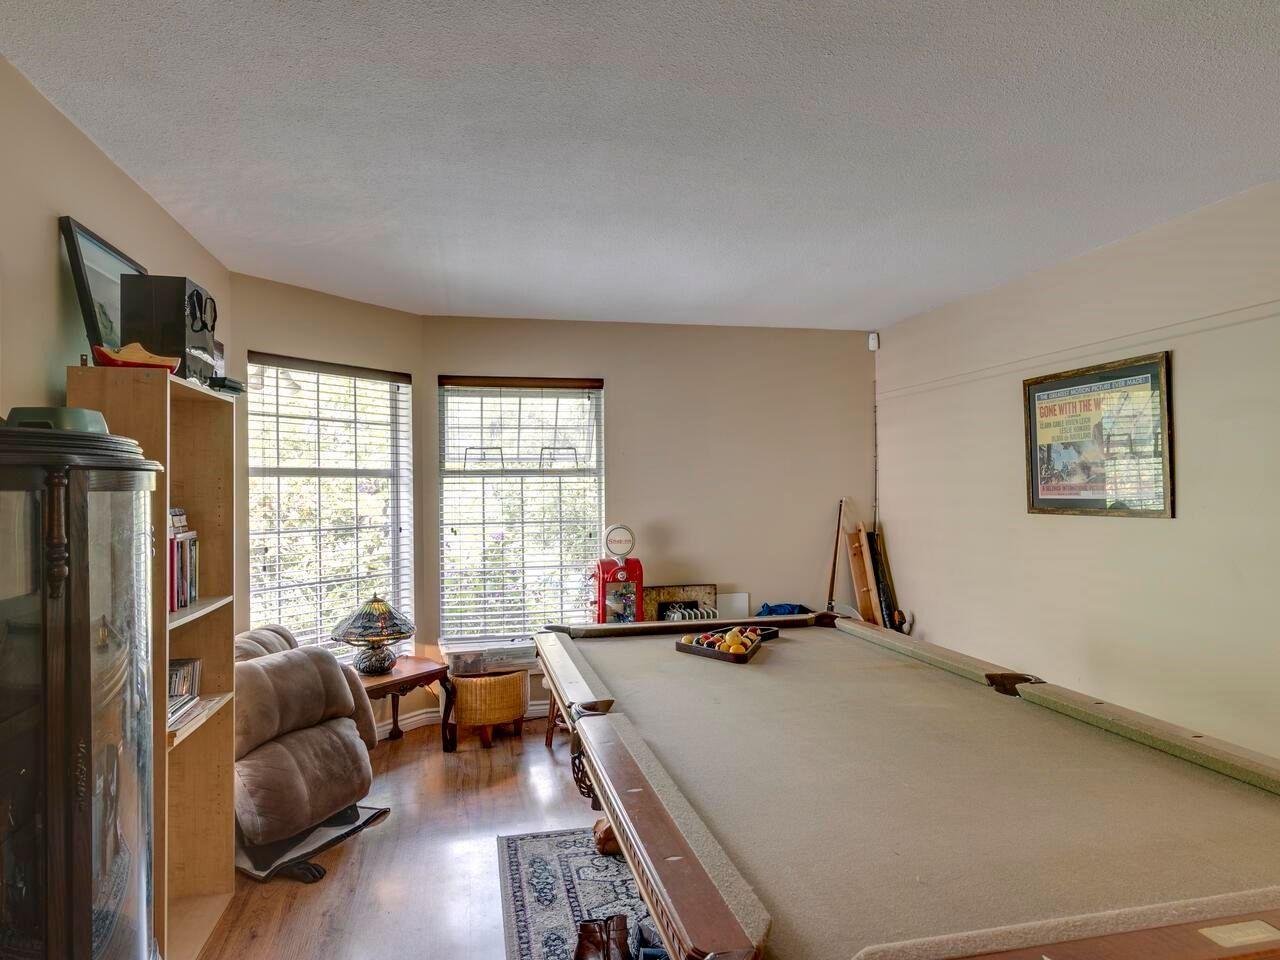 "Photo 6: Photos: 21374 RIVER Road in Maple Ridge: Southwest Maple Ridge House for sale in ""River Road"" : MLS®# R2600142"